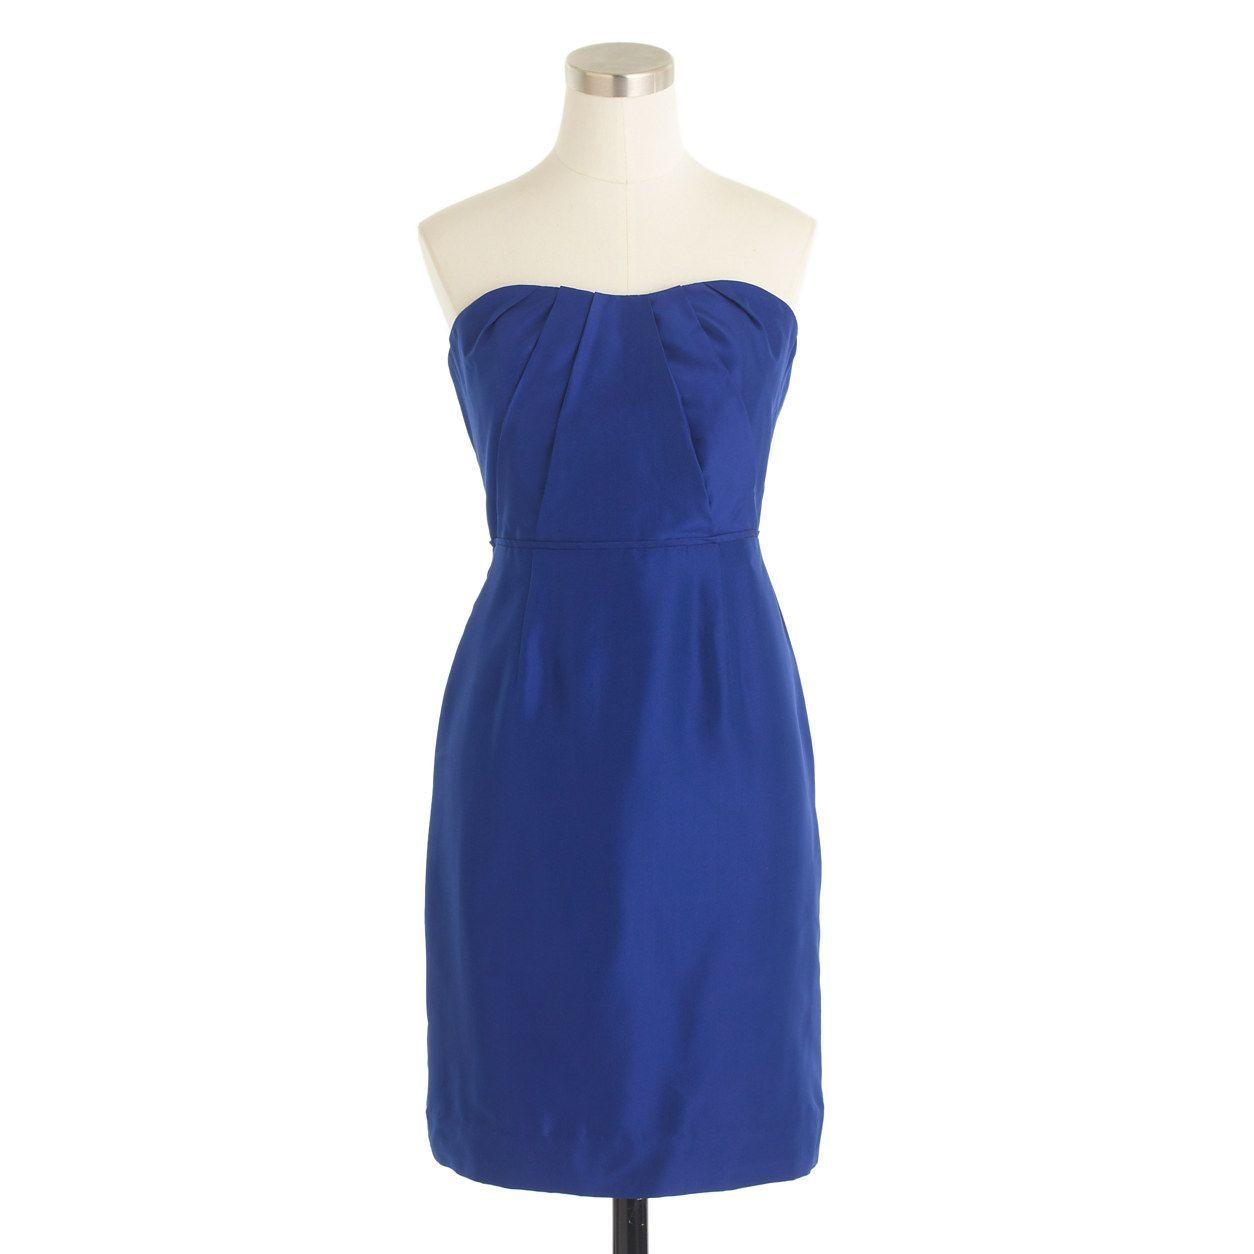 J.Crew Womens Petite Alexia Dress In Slub Silk (Size 10 Petite)